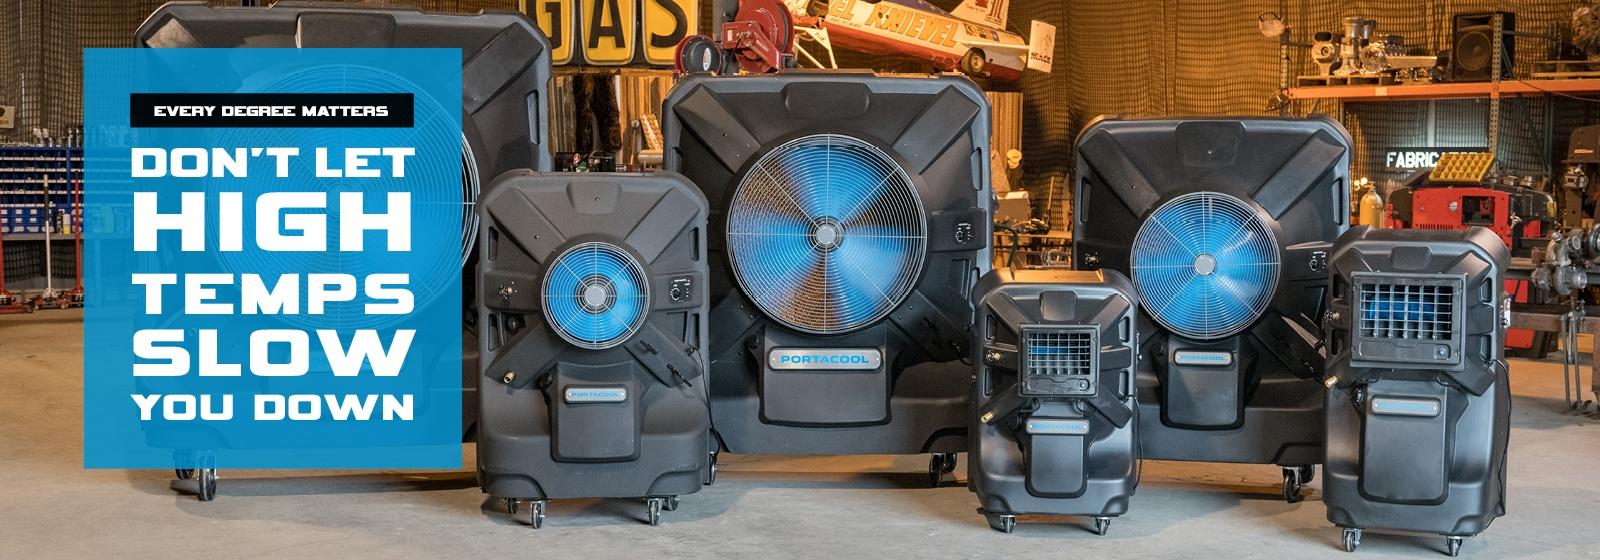 Portable Portable evaporative coolers